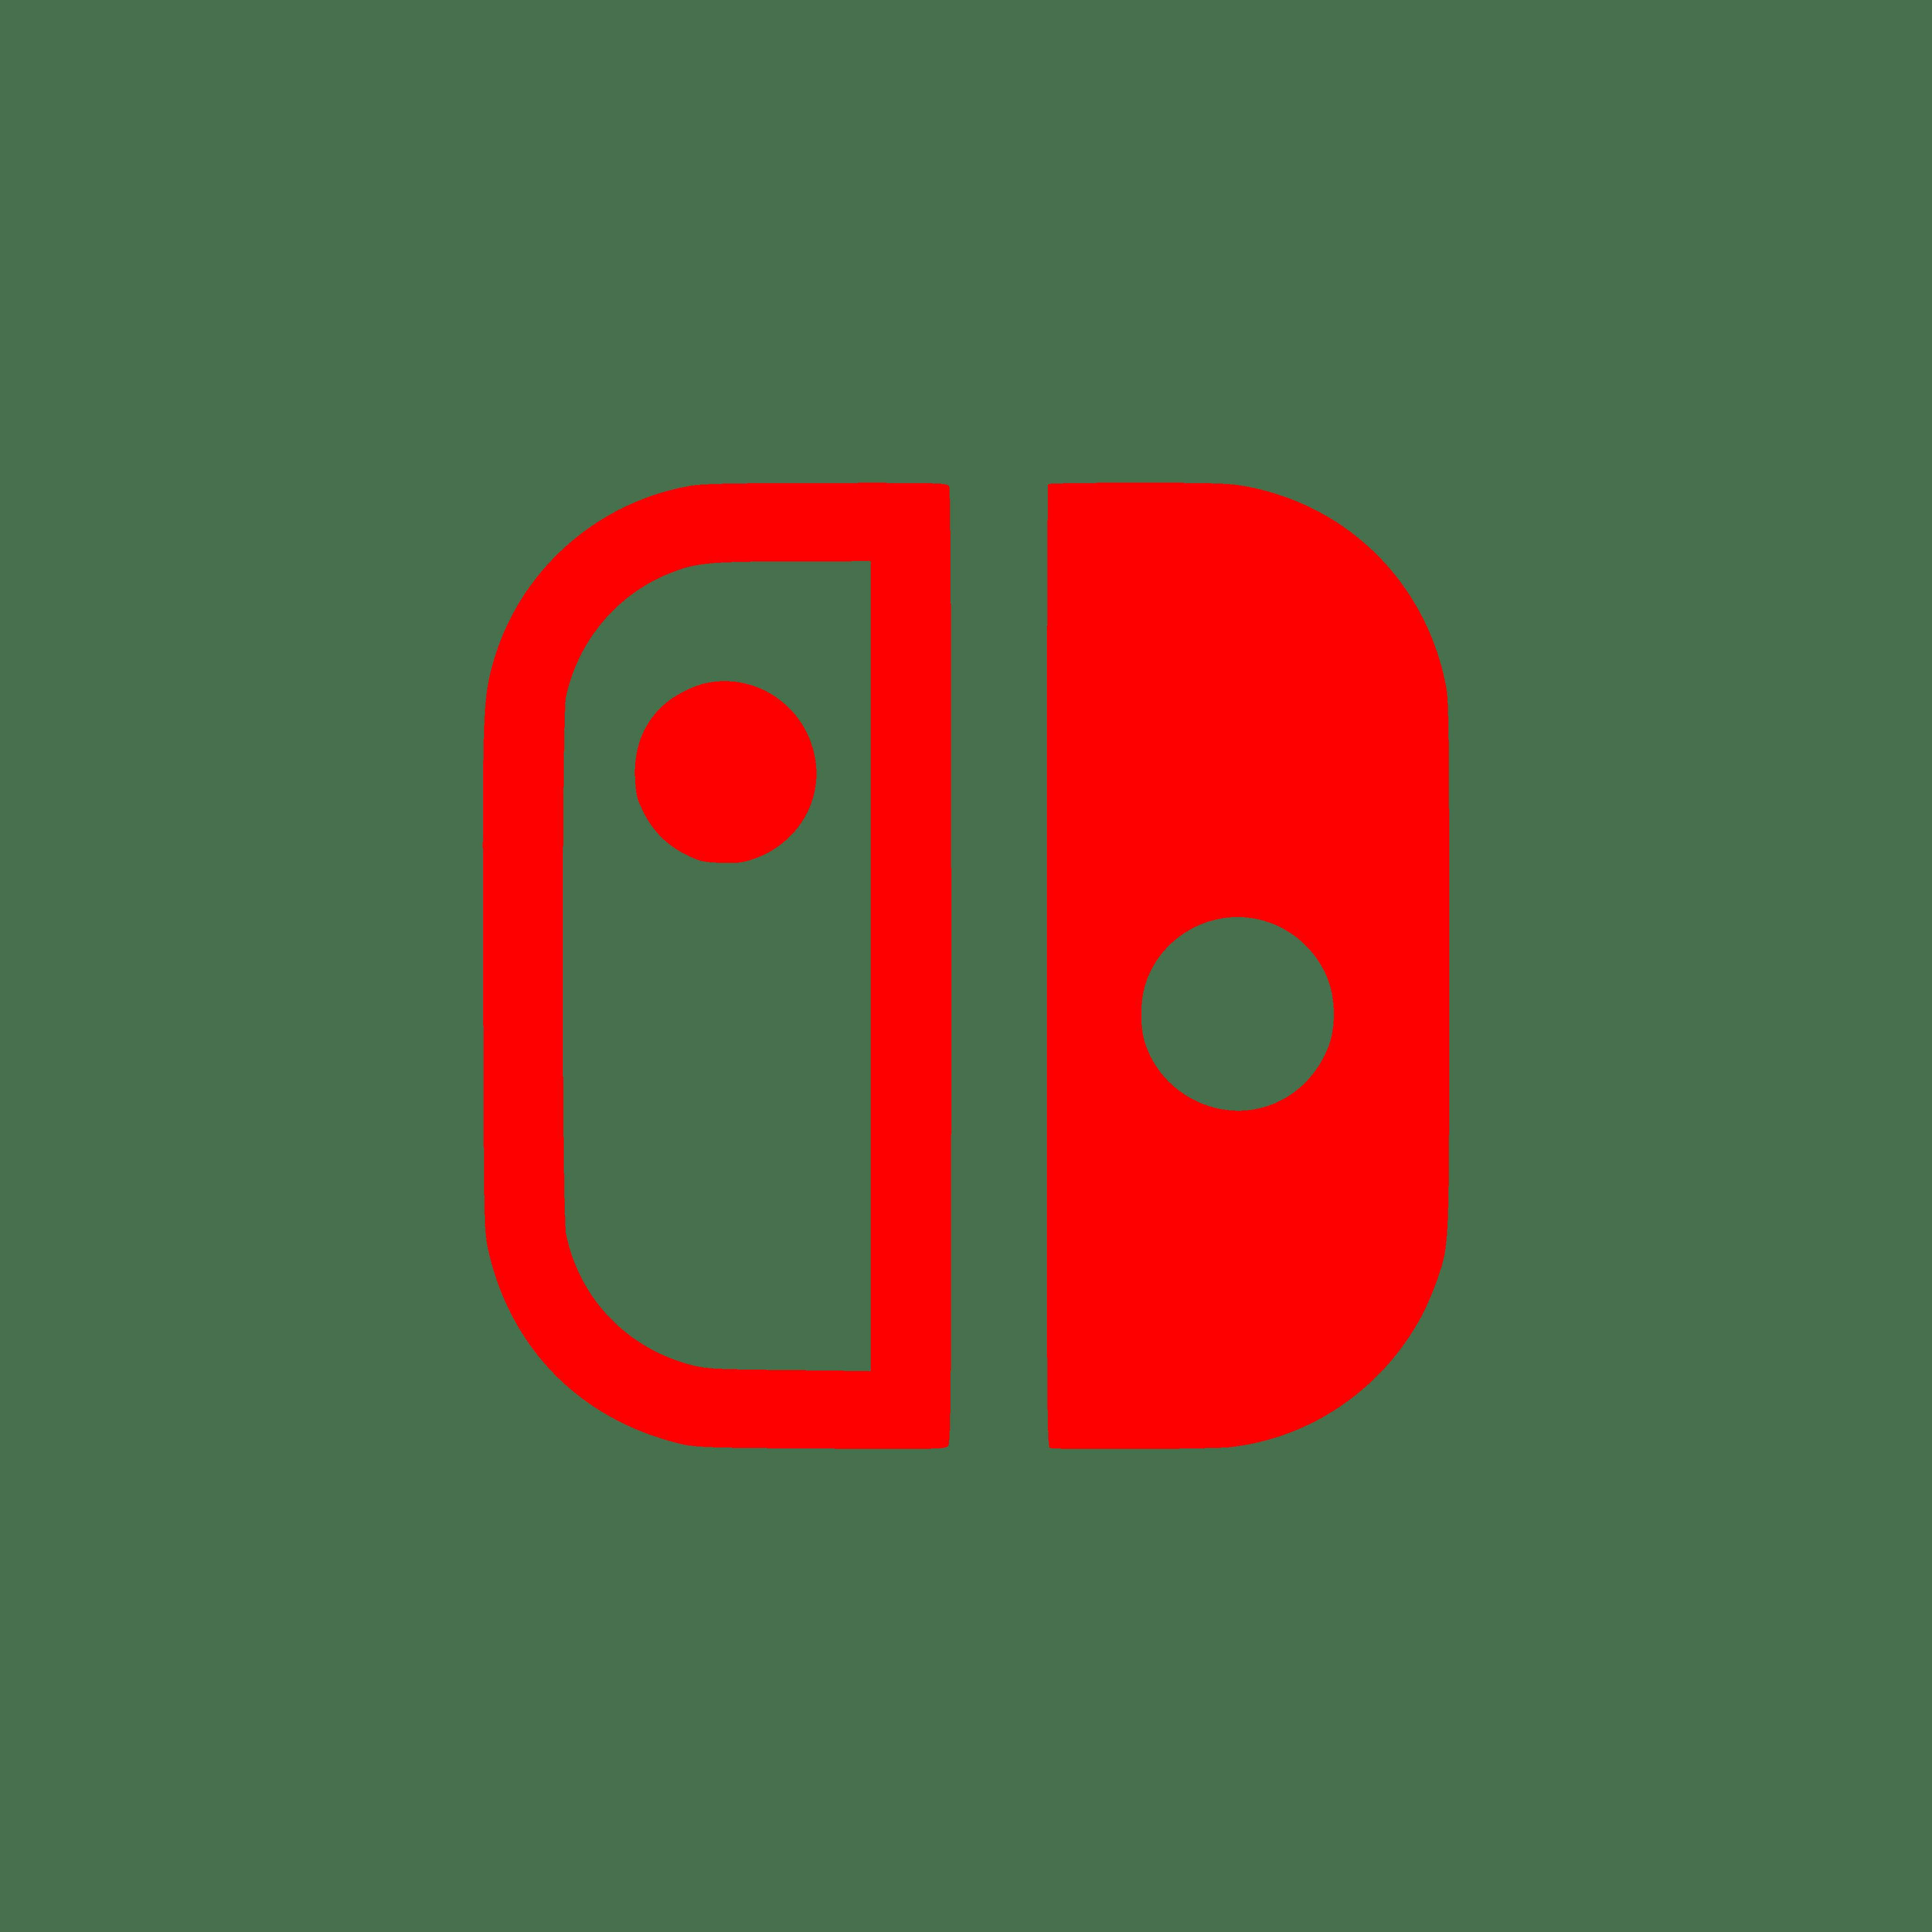 Switch Colour